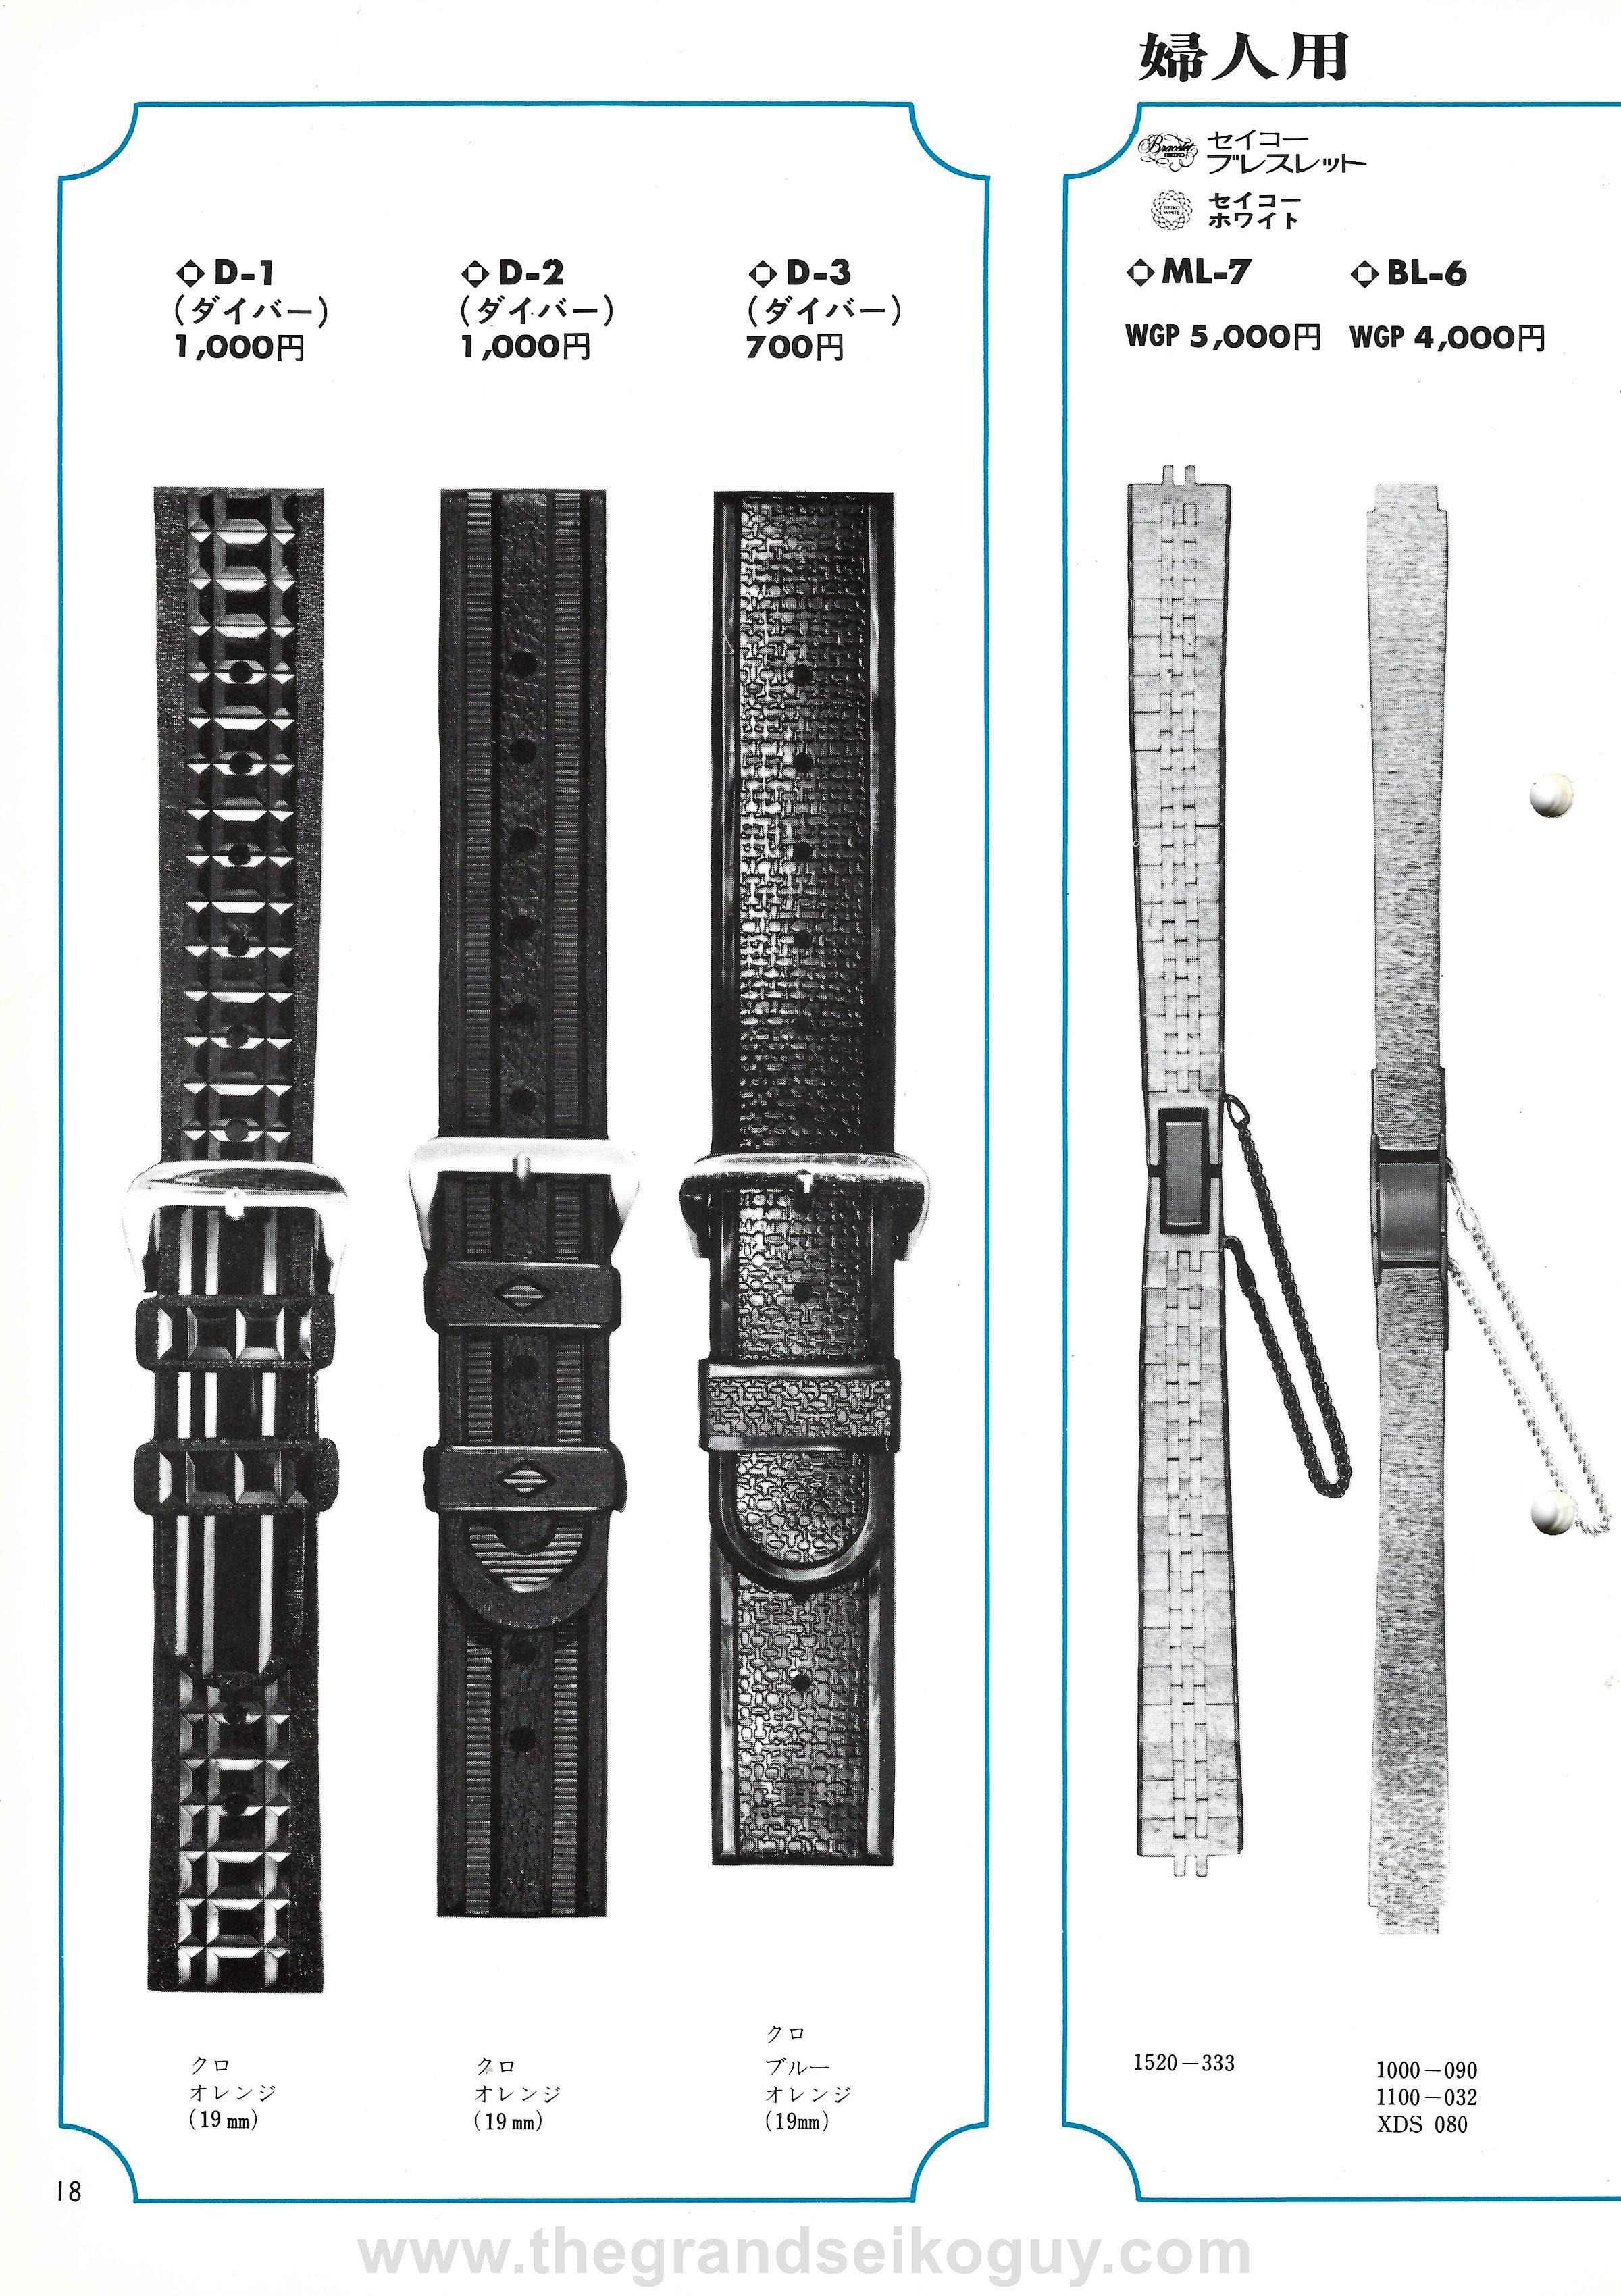 1972 No.1 Watchband Catalog